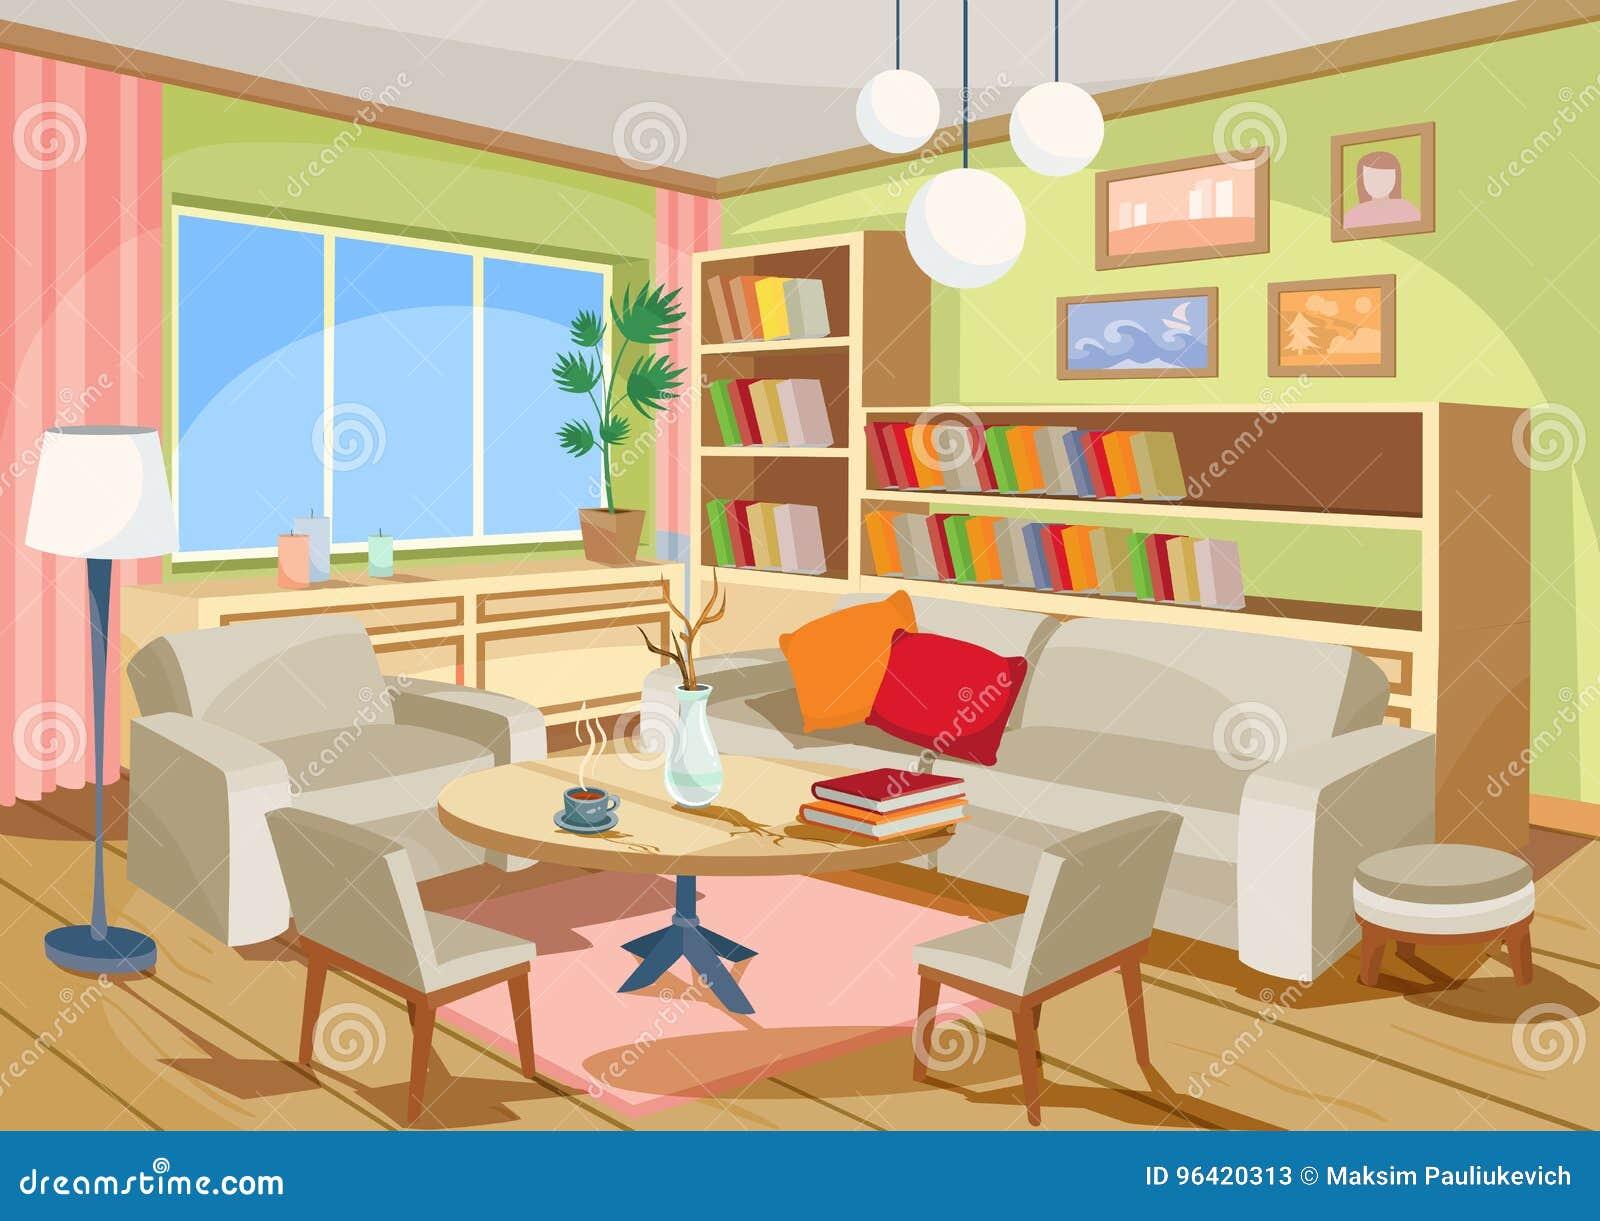 Strange Vector Illustration Of A Cozy Cartoon Interior Of A Home Download Free Architecture Designs Fluibritishbridgeorg